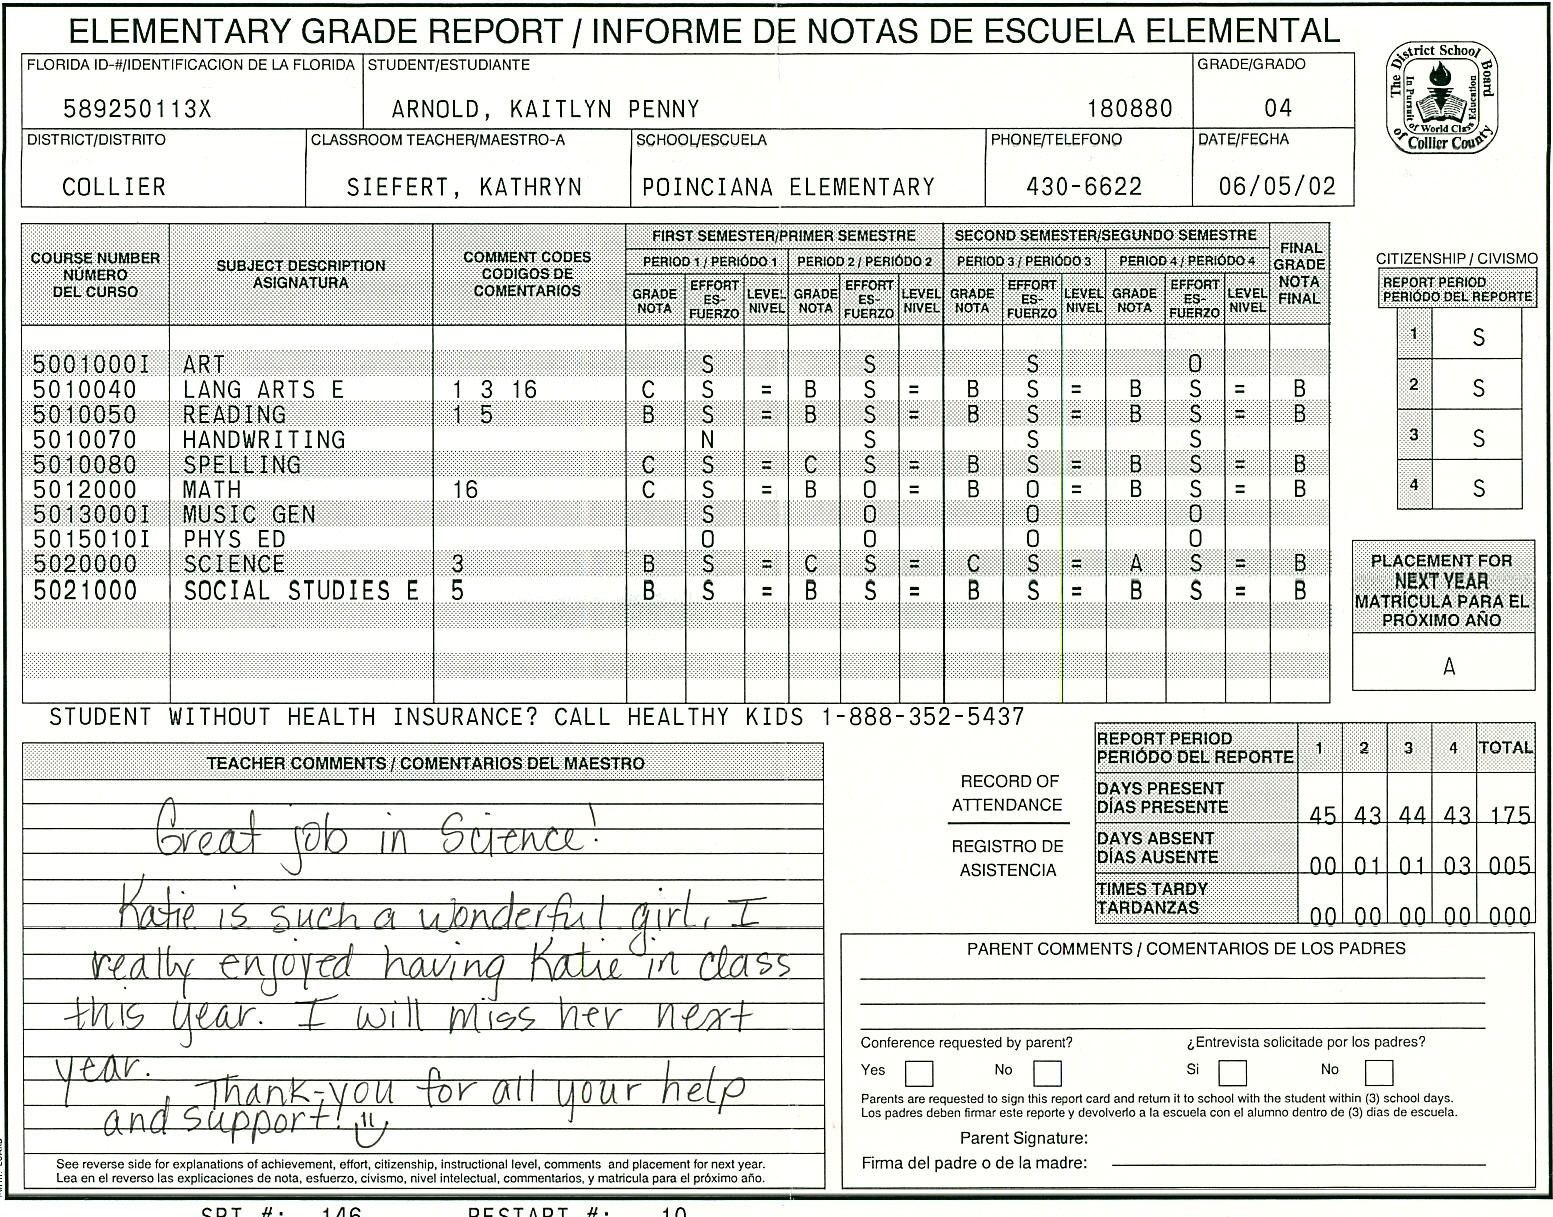 Elementary School Report Card Template  Homeschooling  Report Card With Homeschool Middle School Report Card Template